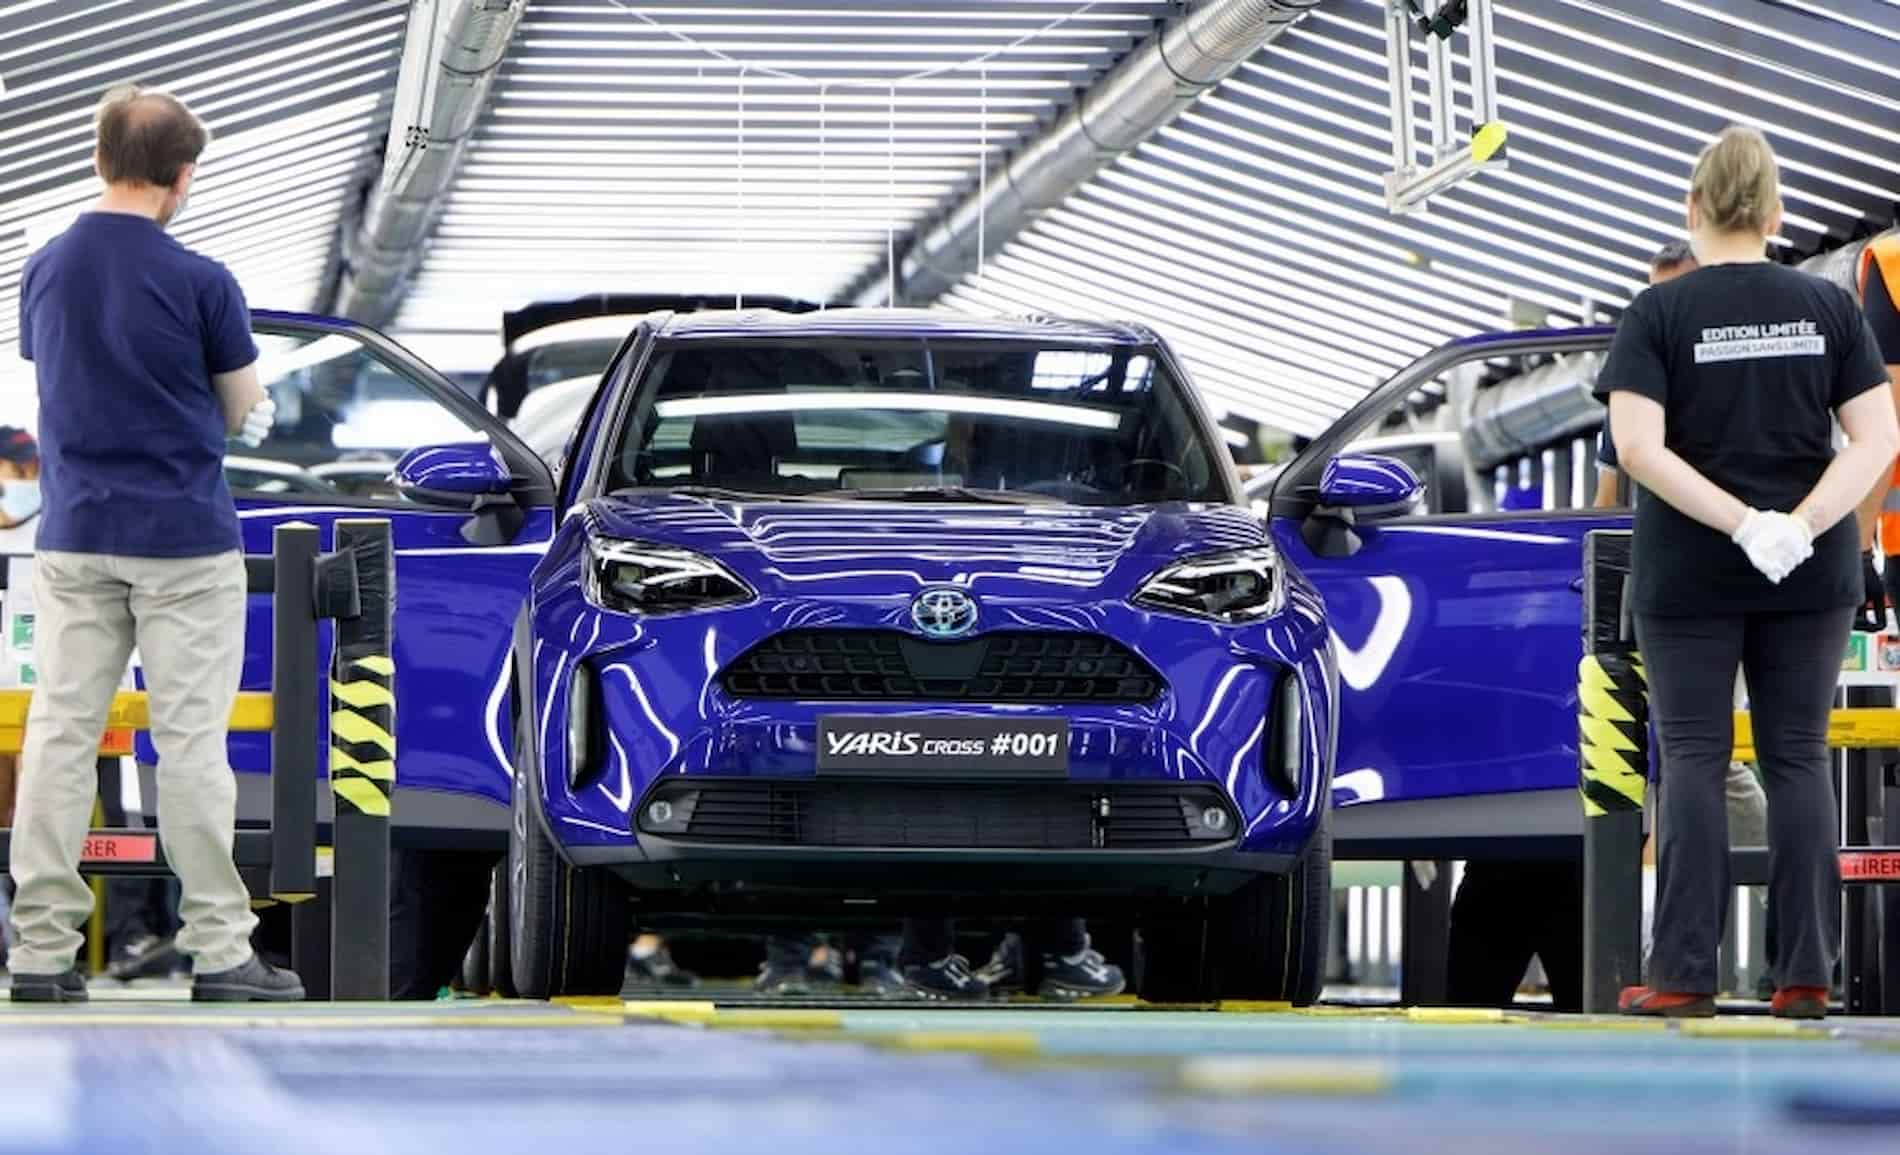 Toyota Yaris Cross 2021 production Europe 2